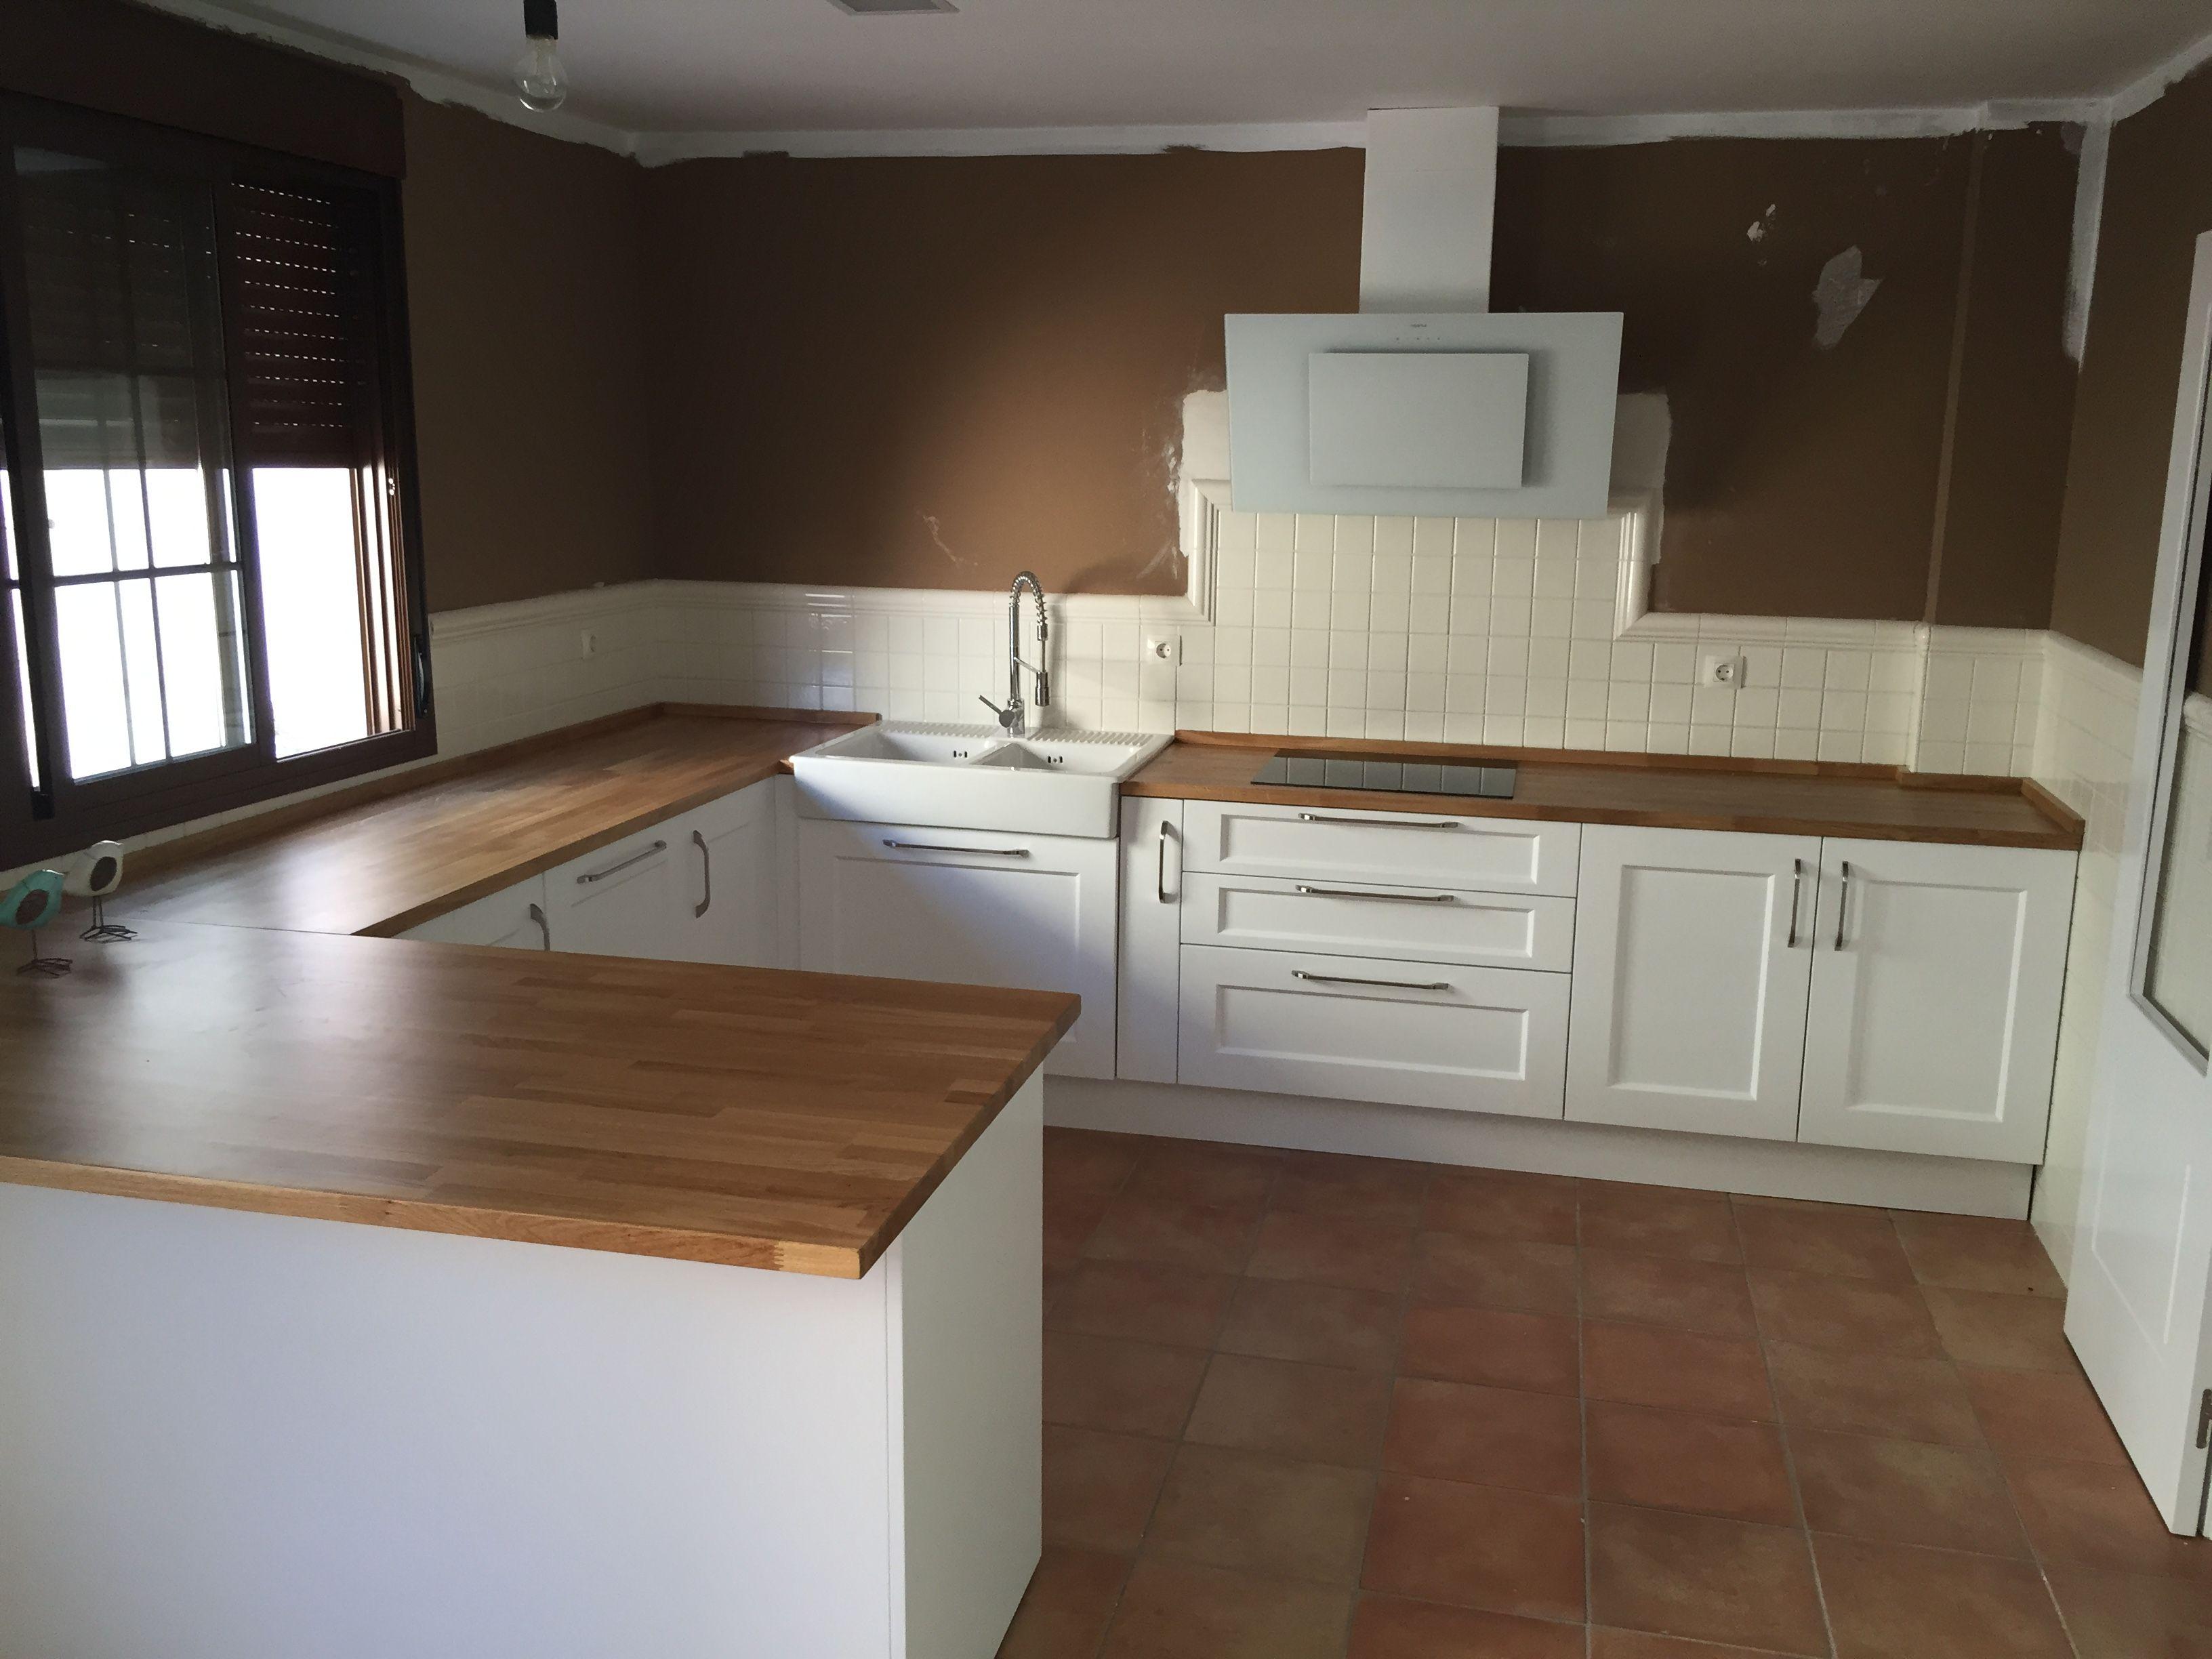 Cocina de dise o n rdico escandinavo puertas lacadas - Cocinas blancas de diseno ...